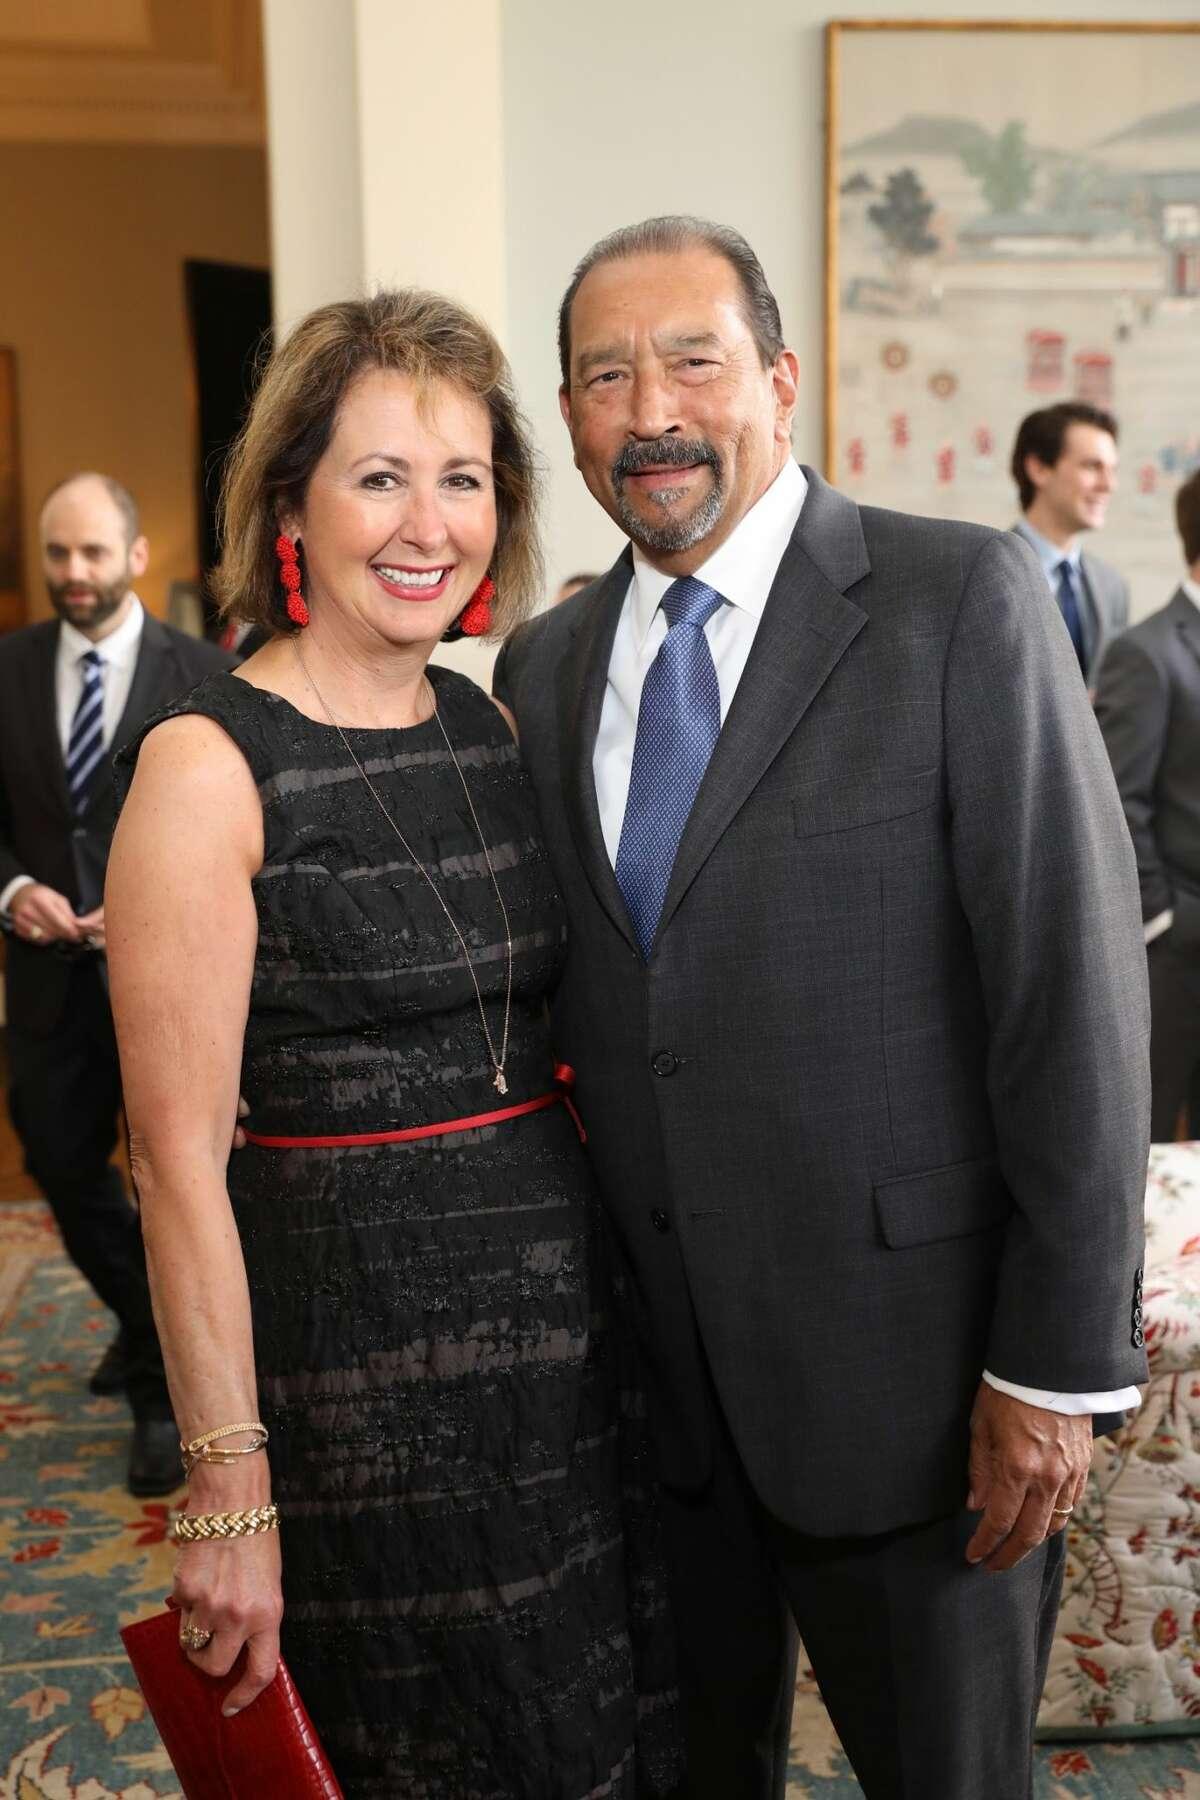 Ileana and Michael Trevino